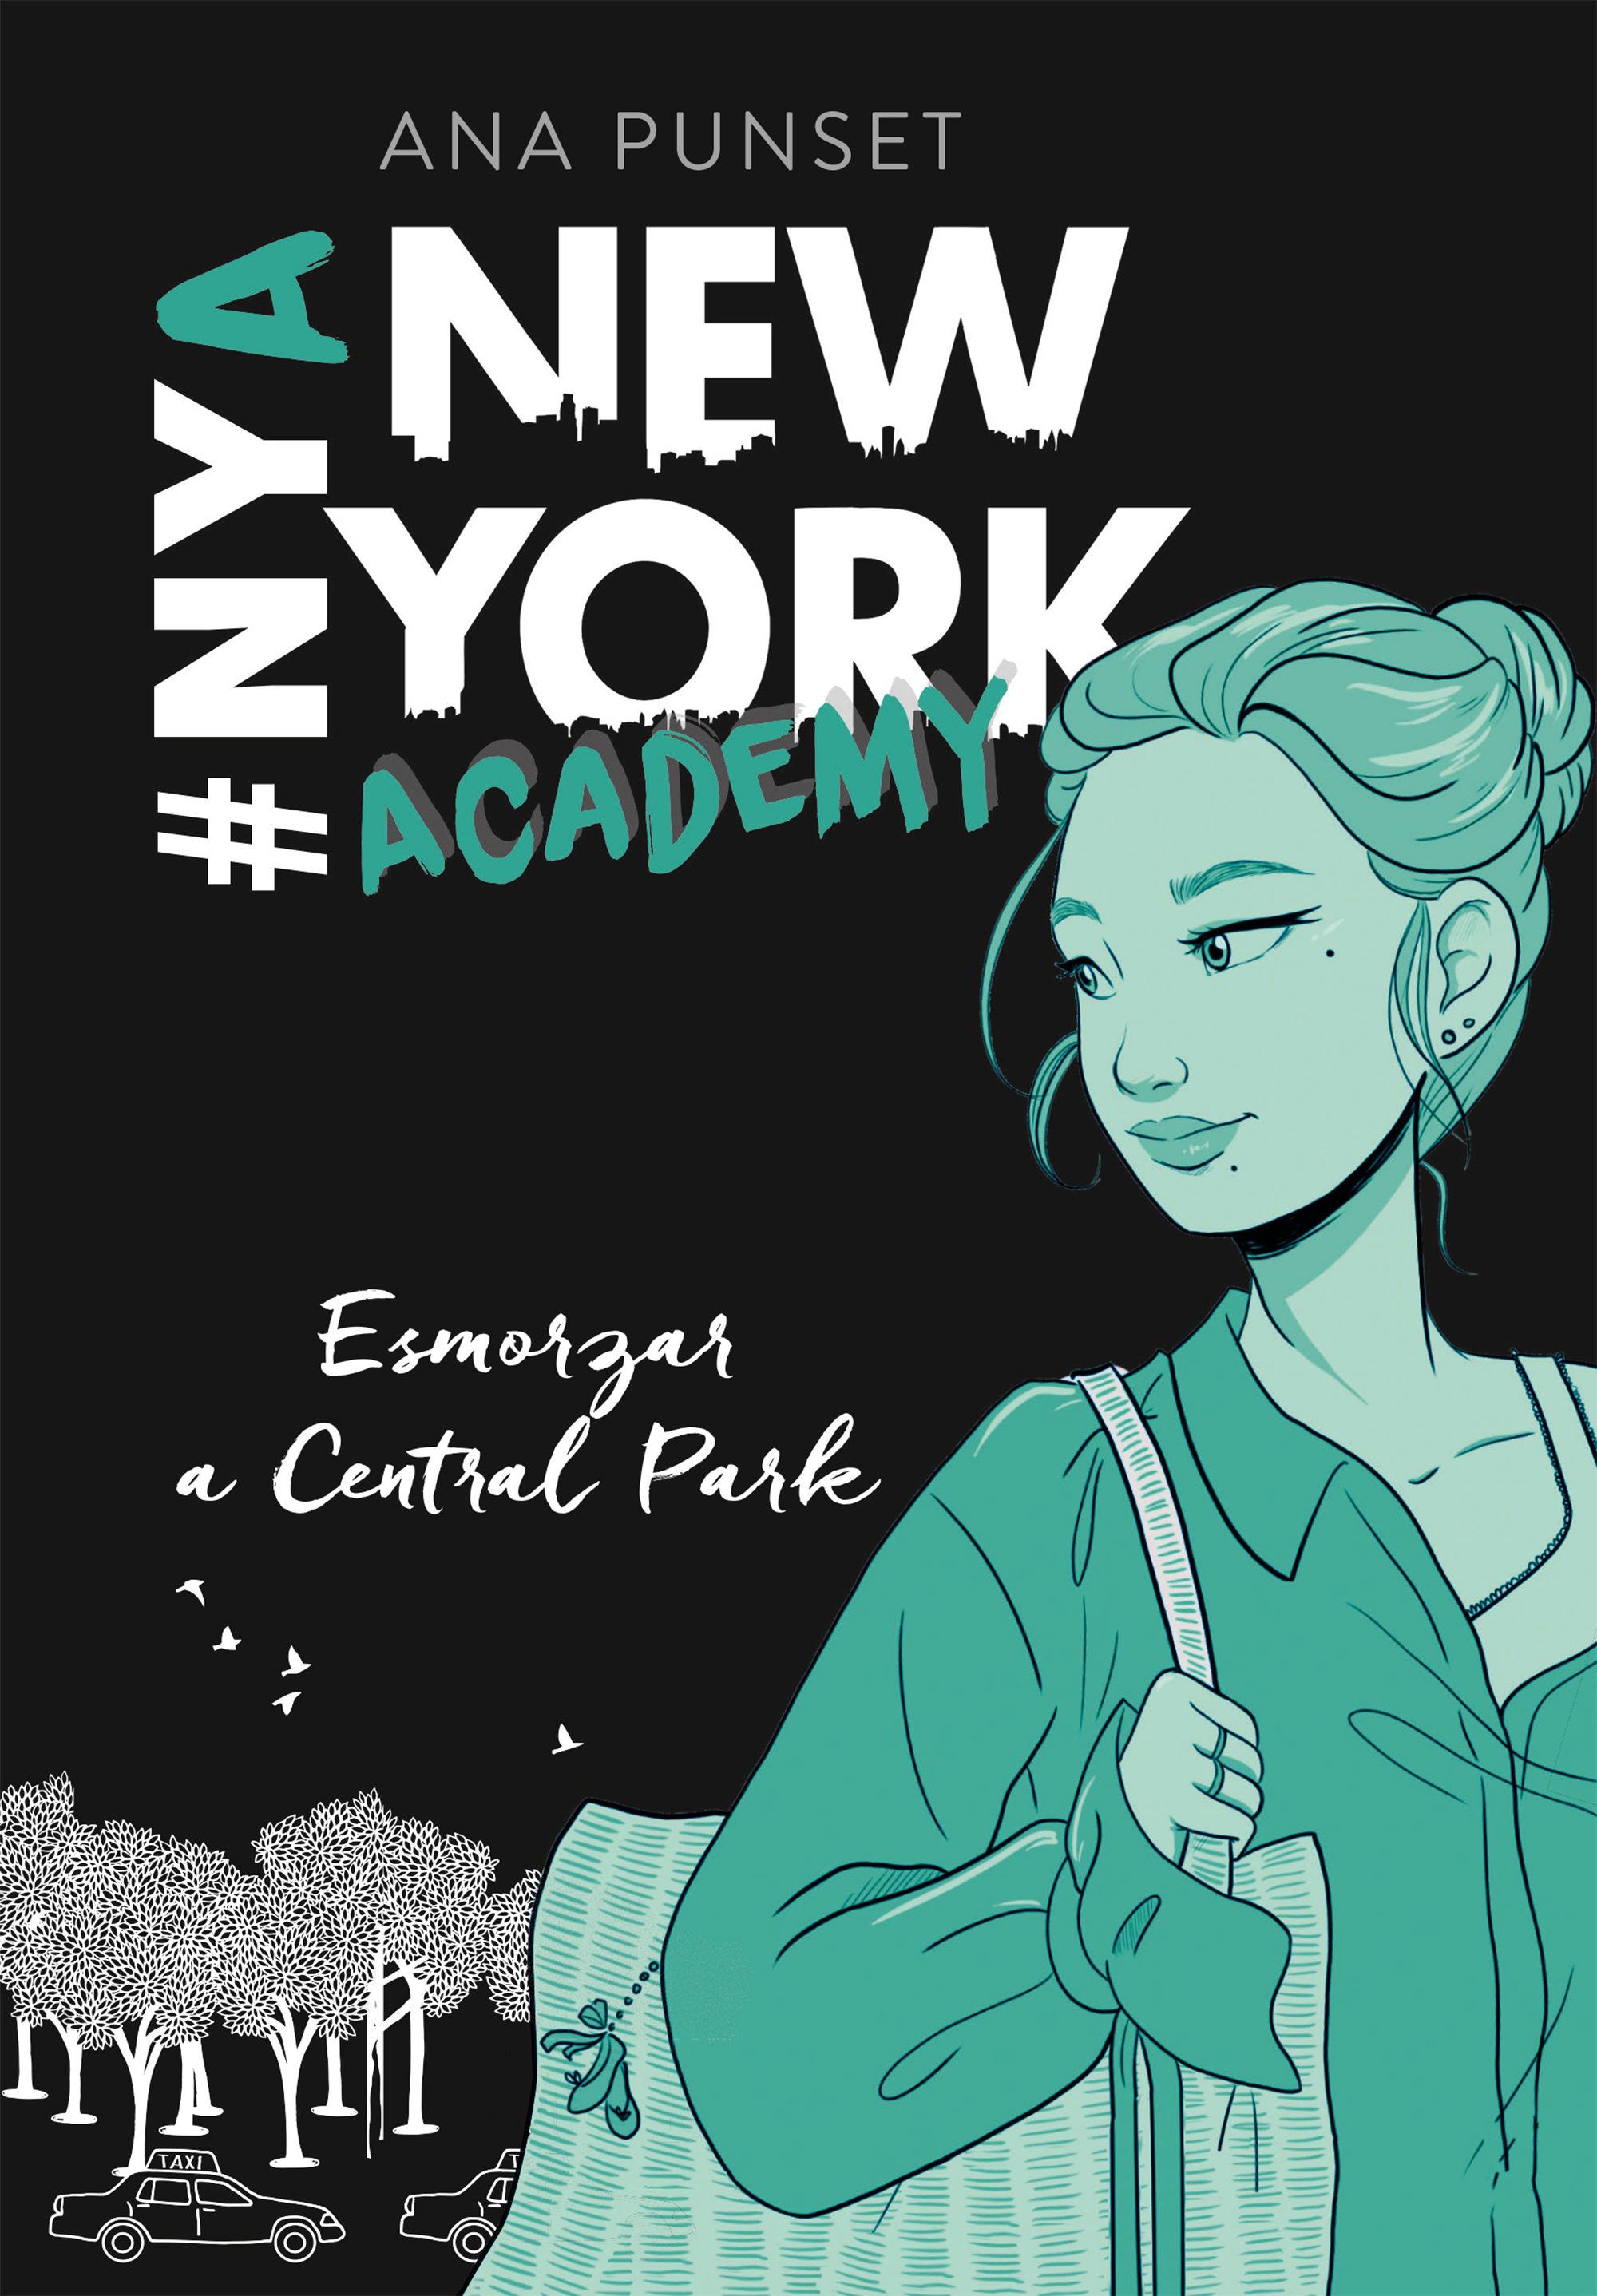 NEW YORK ACADEMY 3ESMORZAR A CENTRAL PARK